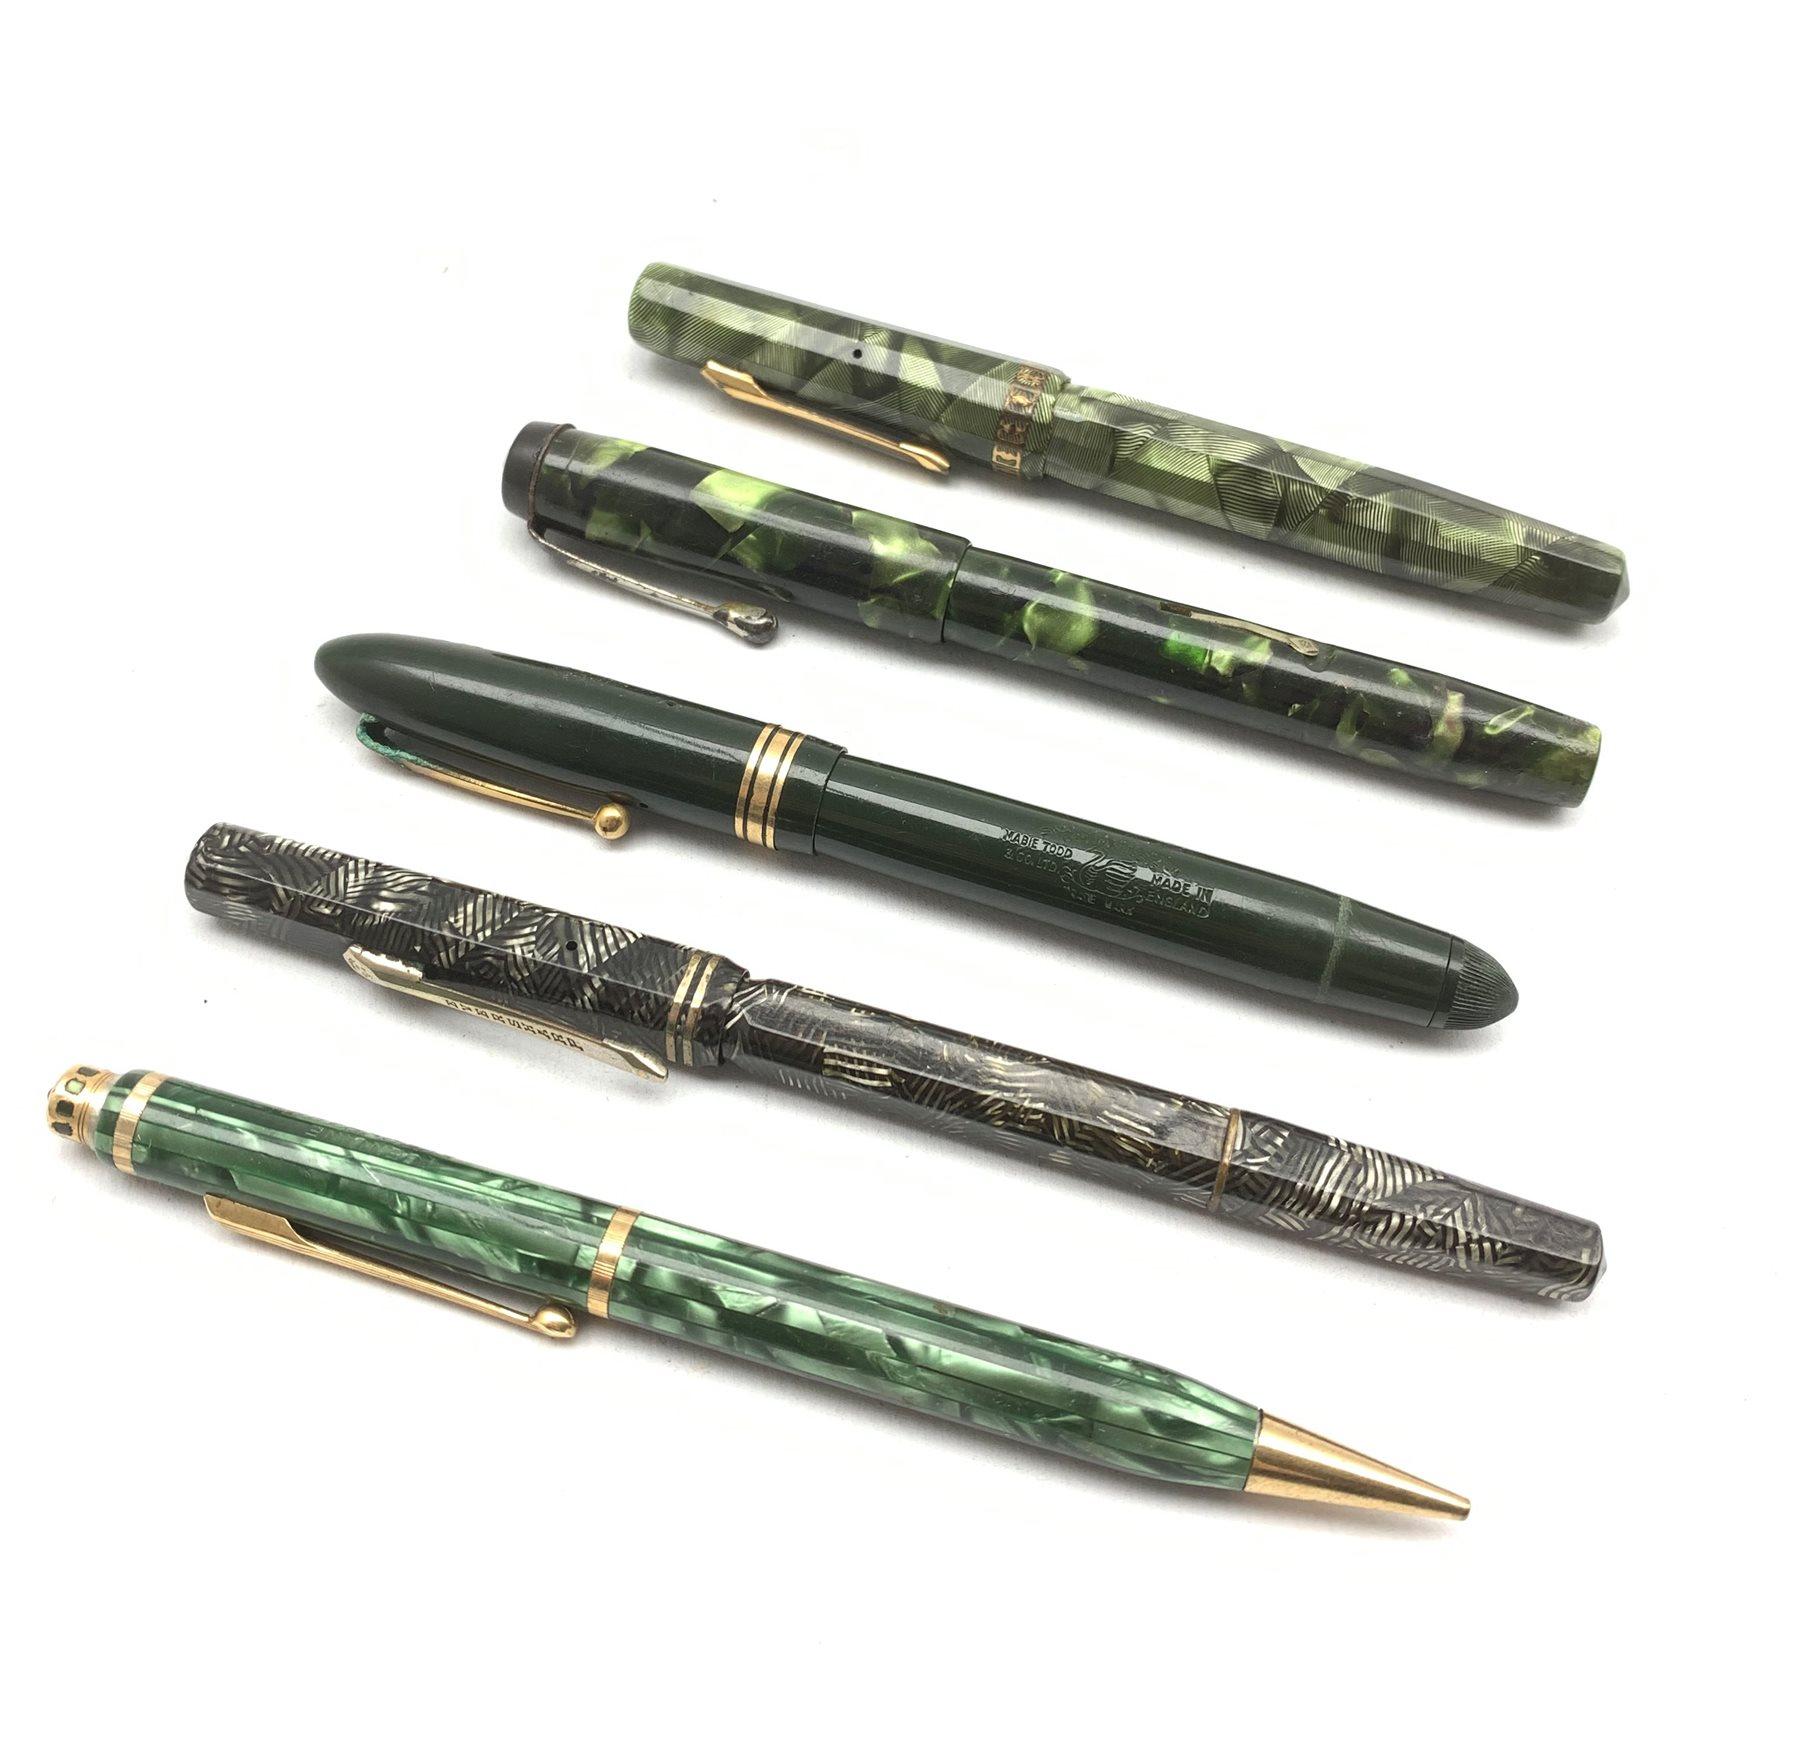 Conaway Stewart 'The Universal Pen' no. 479, Eversharp fountain pen with 14k nib, Eversharp propelli